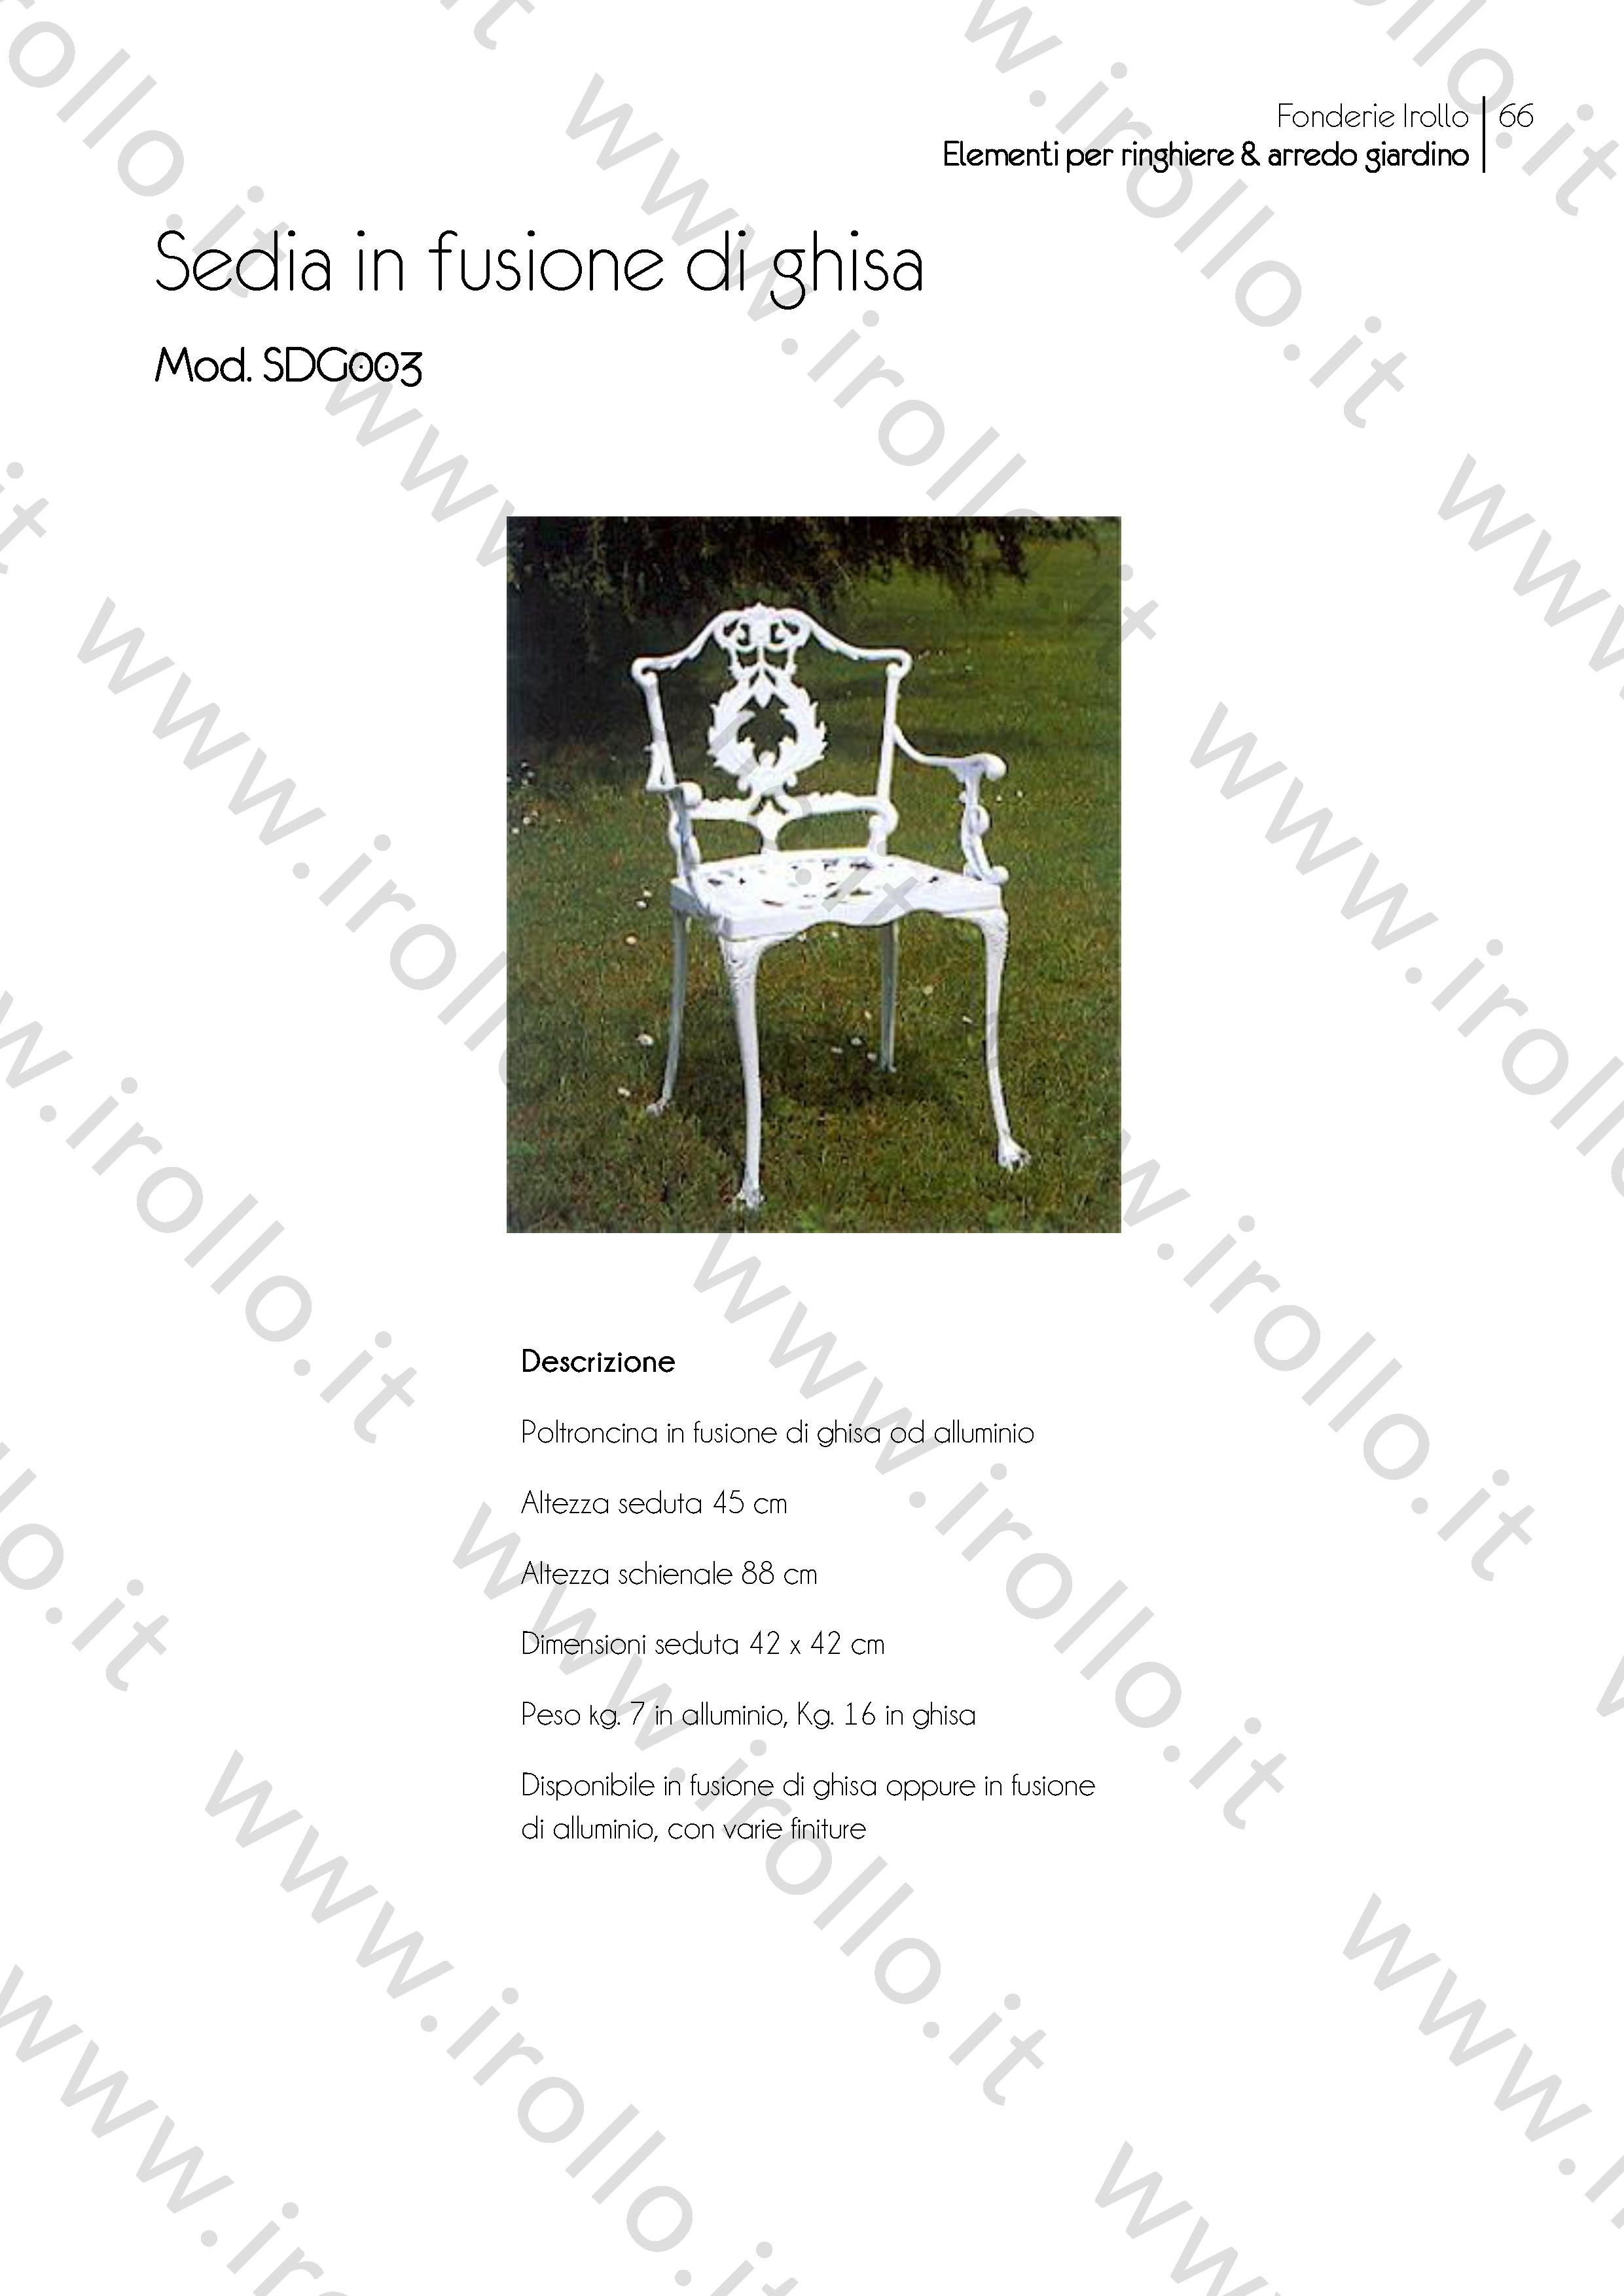 Sedie Da Giardino In Ghisa.Sedia In Fusione Di Ghisa Sdg003 Irollo Arredo Urbano